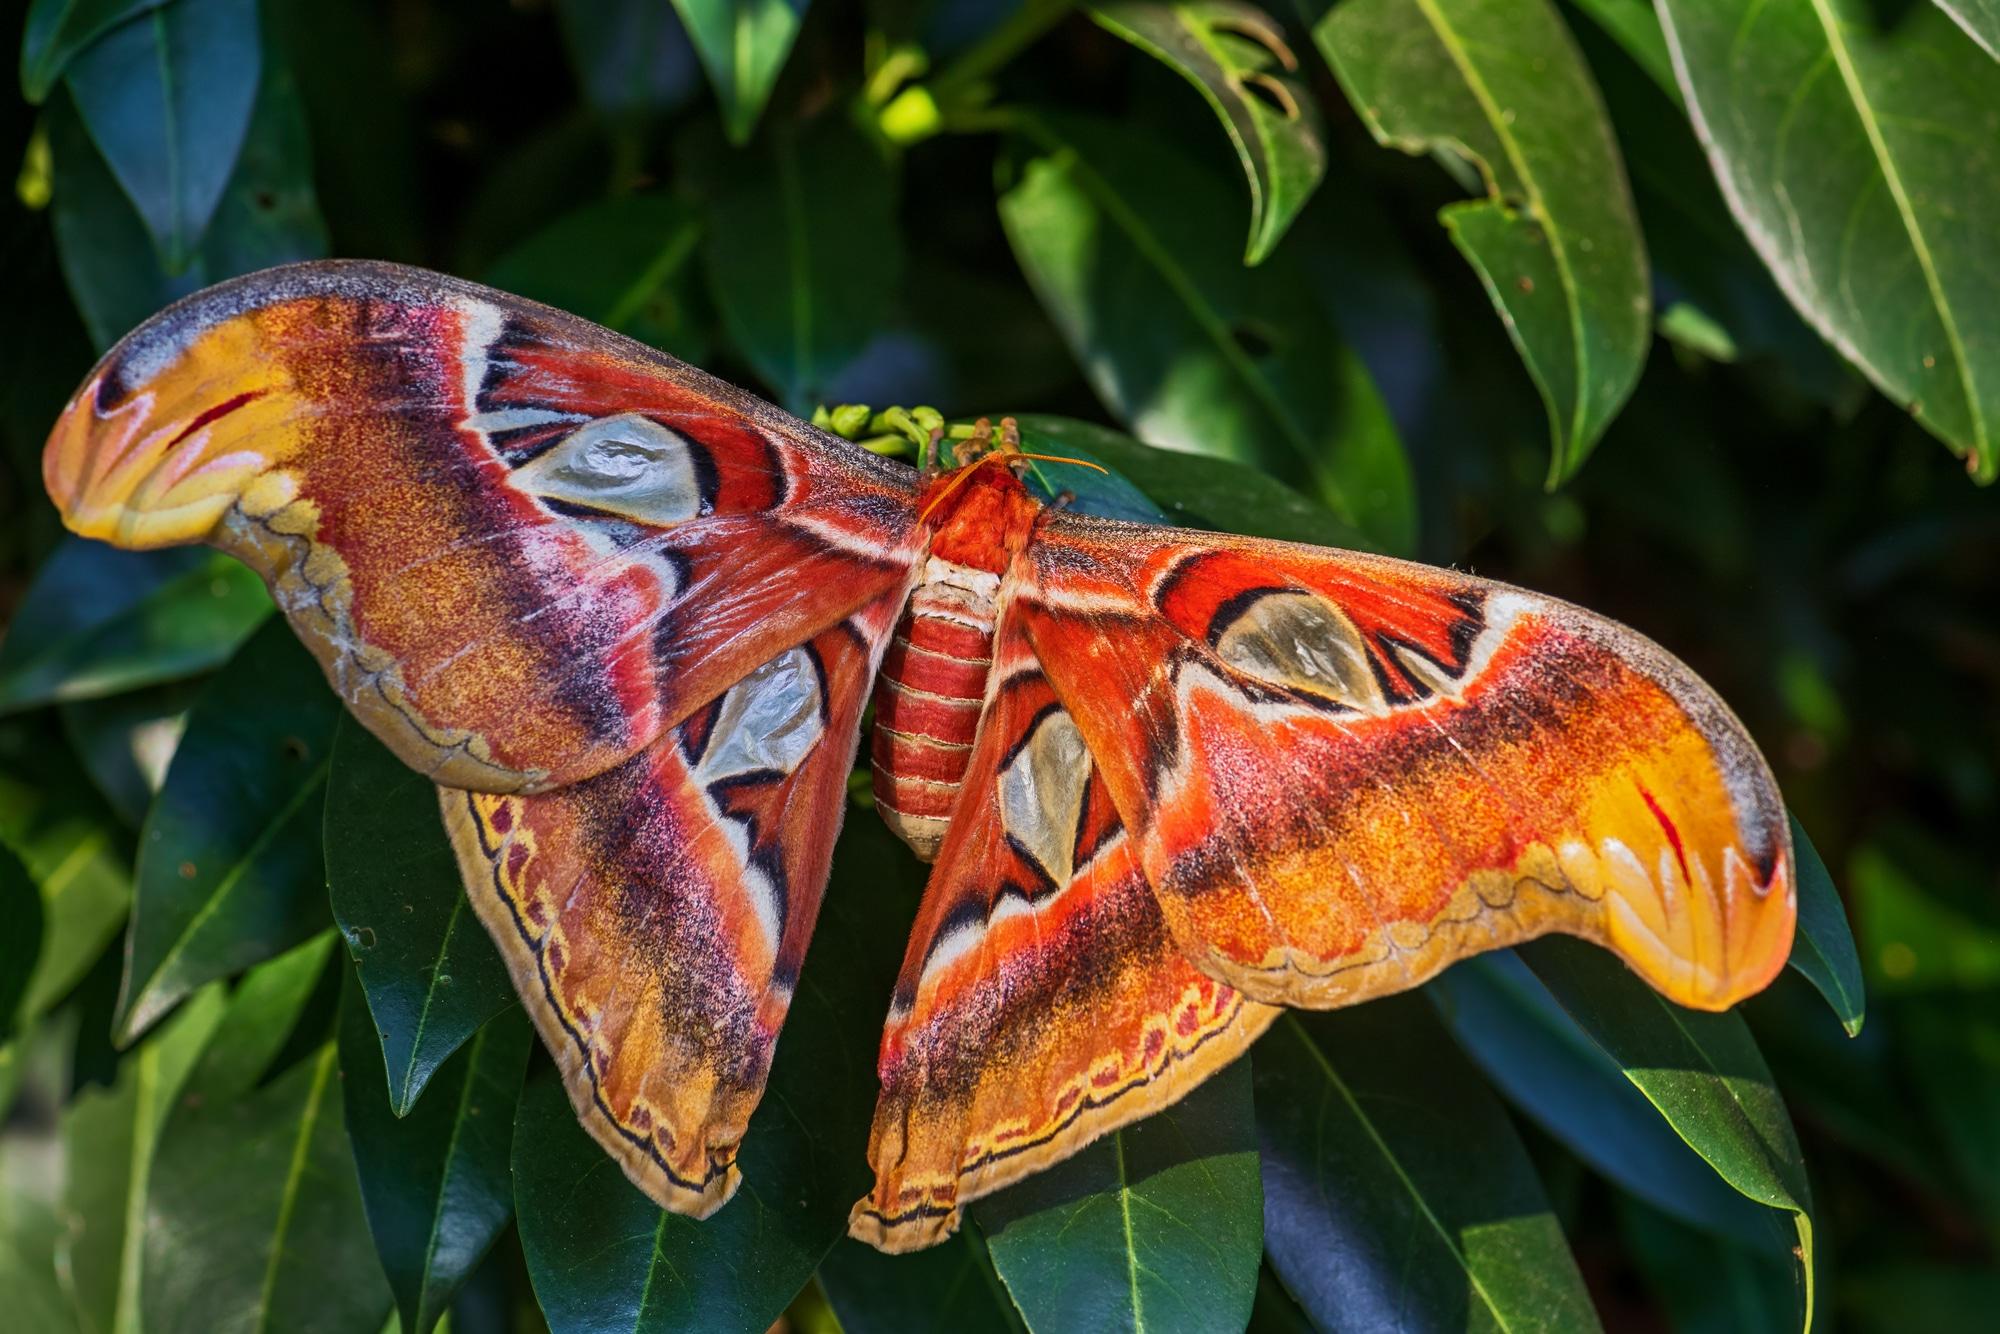 Atlas Moth - Attacus atlas, beautiful large iconic moth